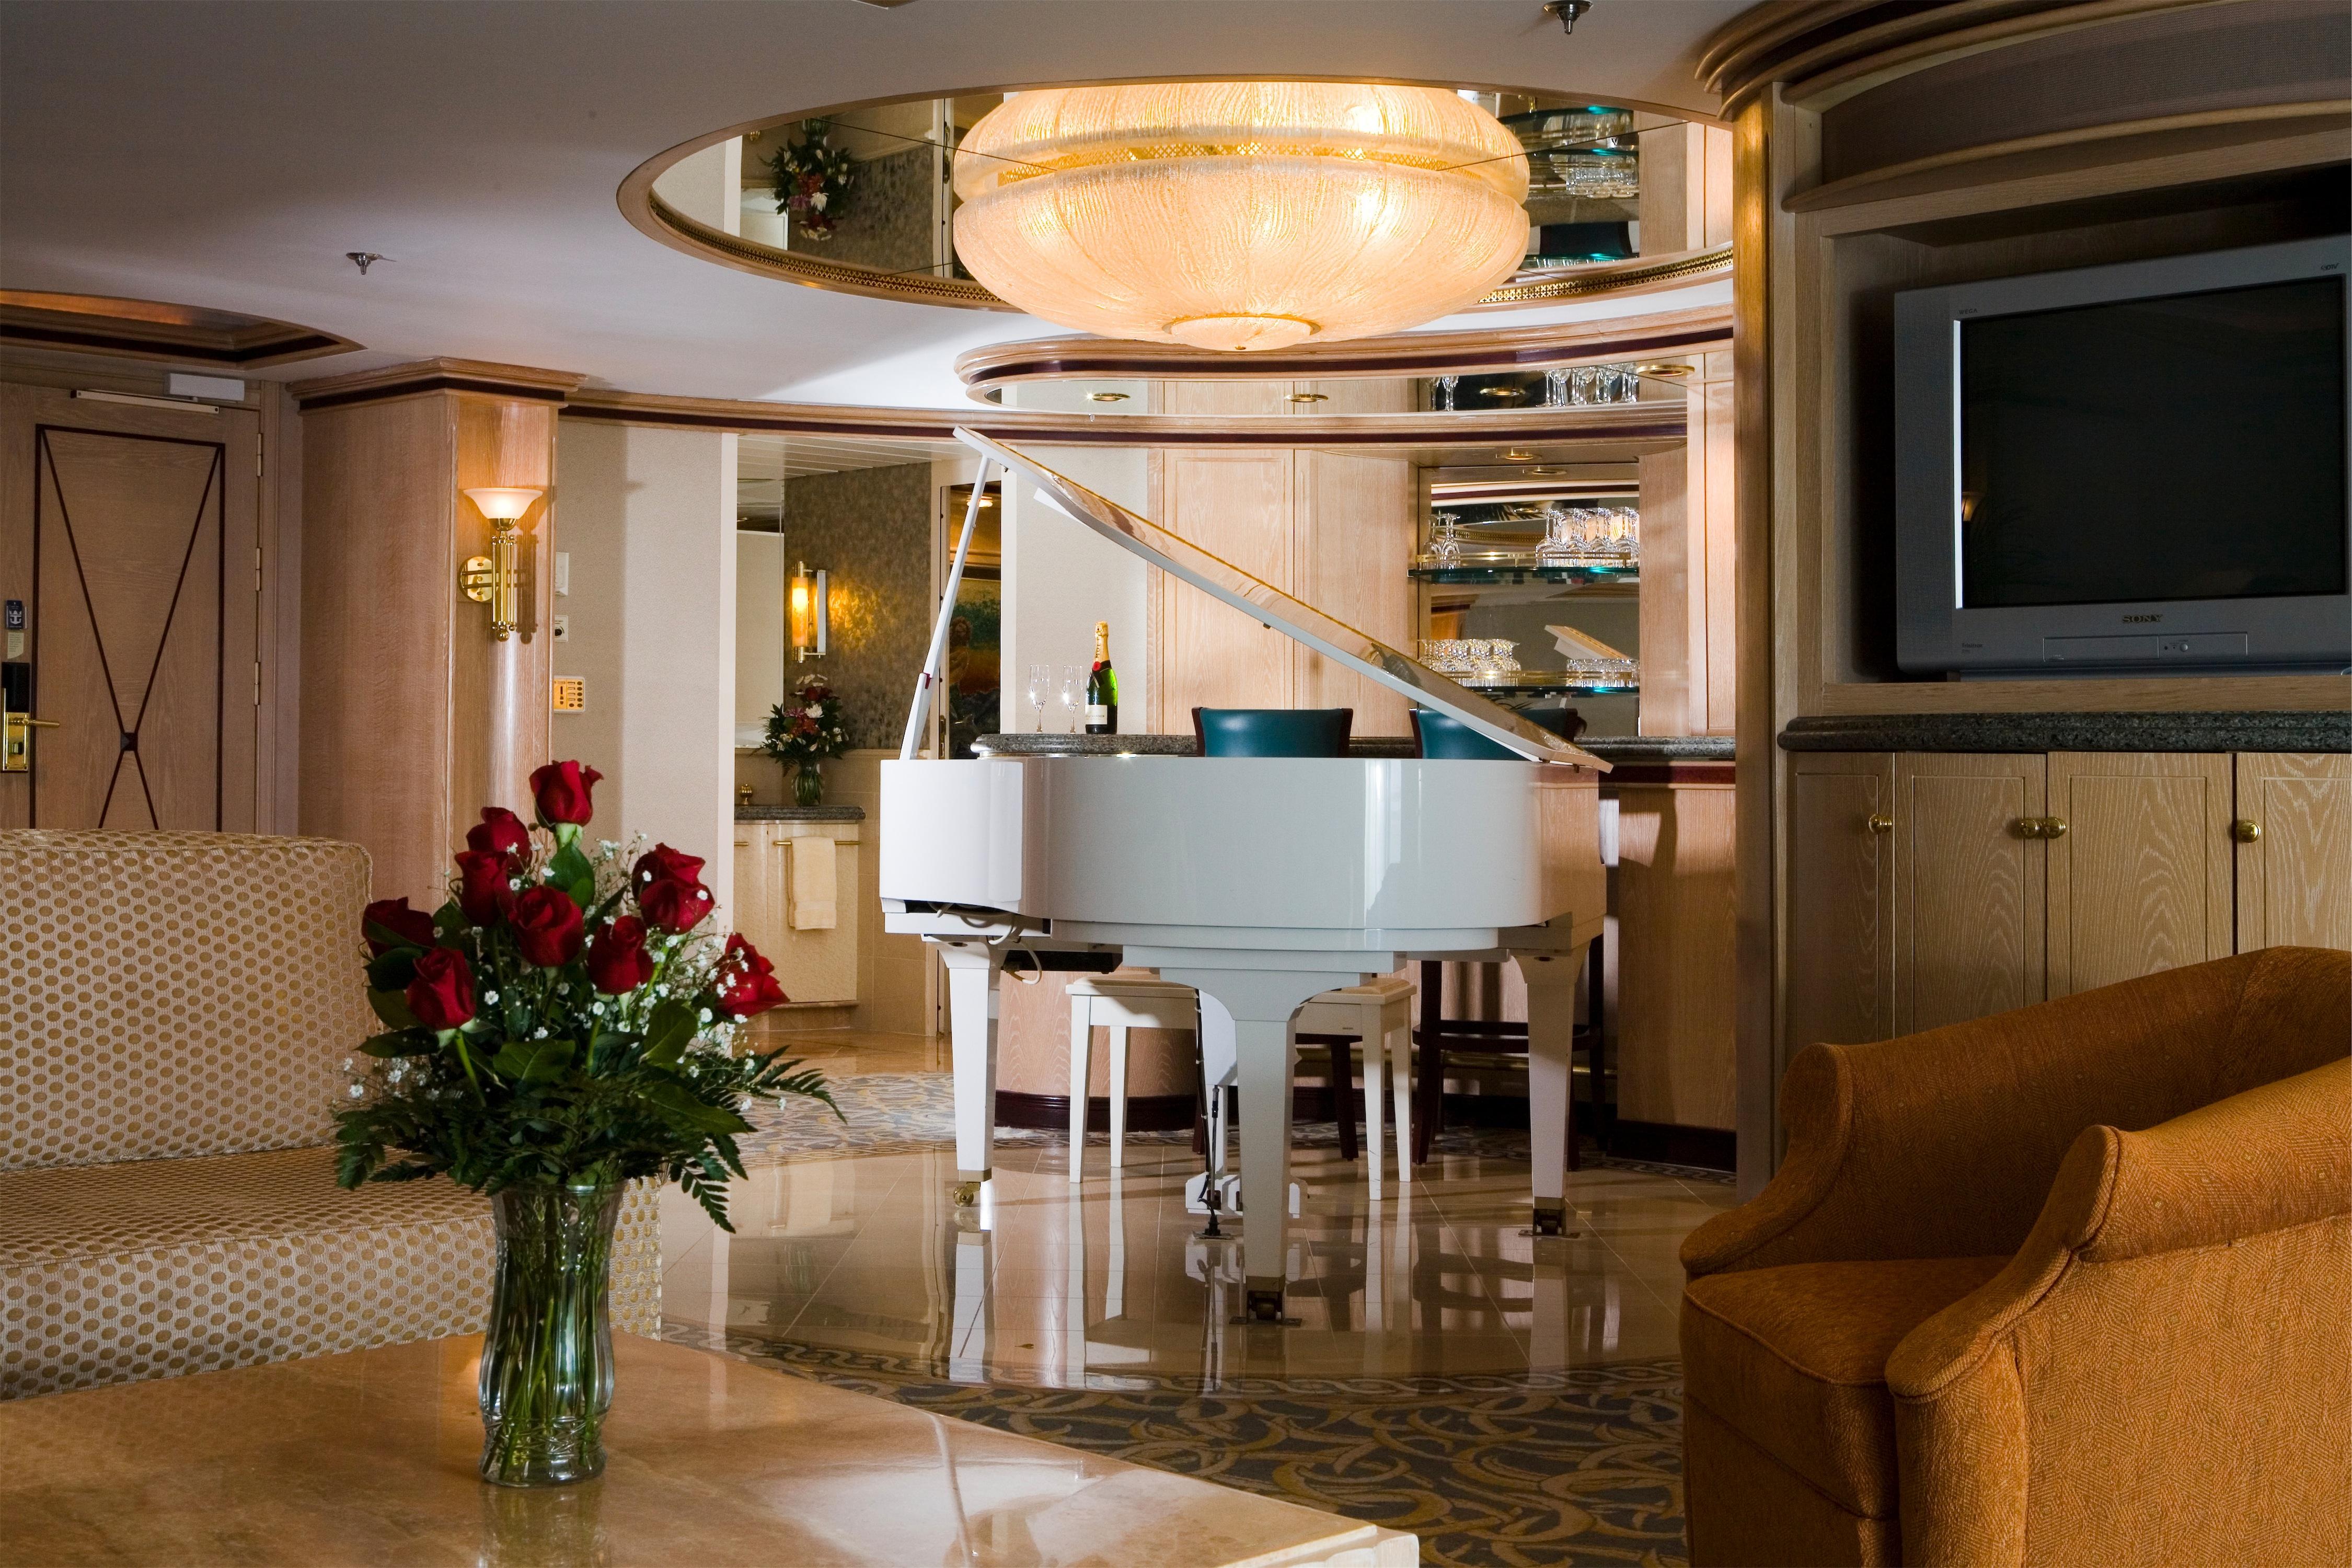 Royal Caribbean International Rhapsody of the Seas Accommodation Suite 5.jpg